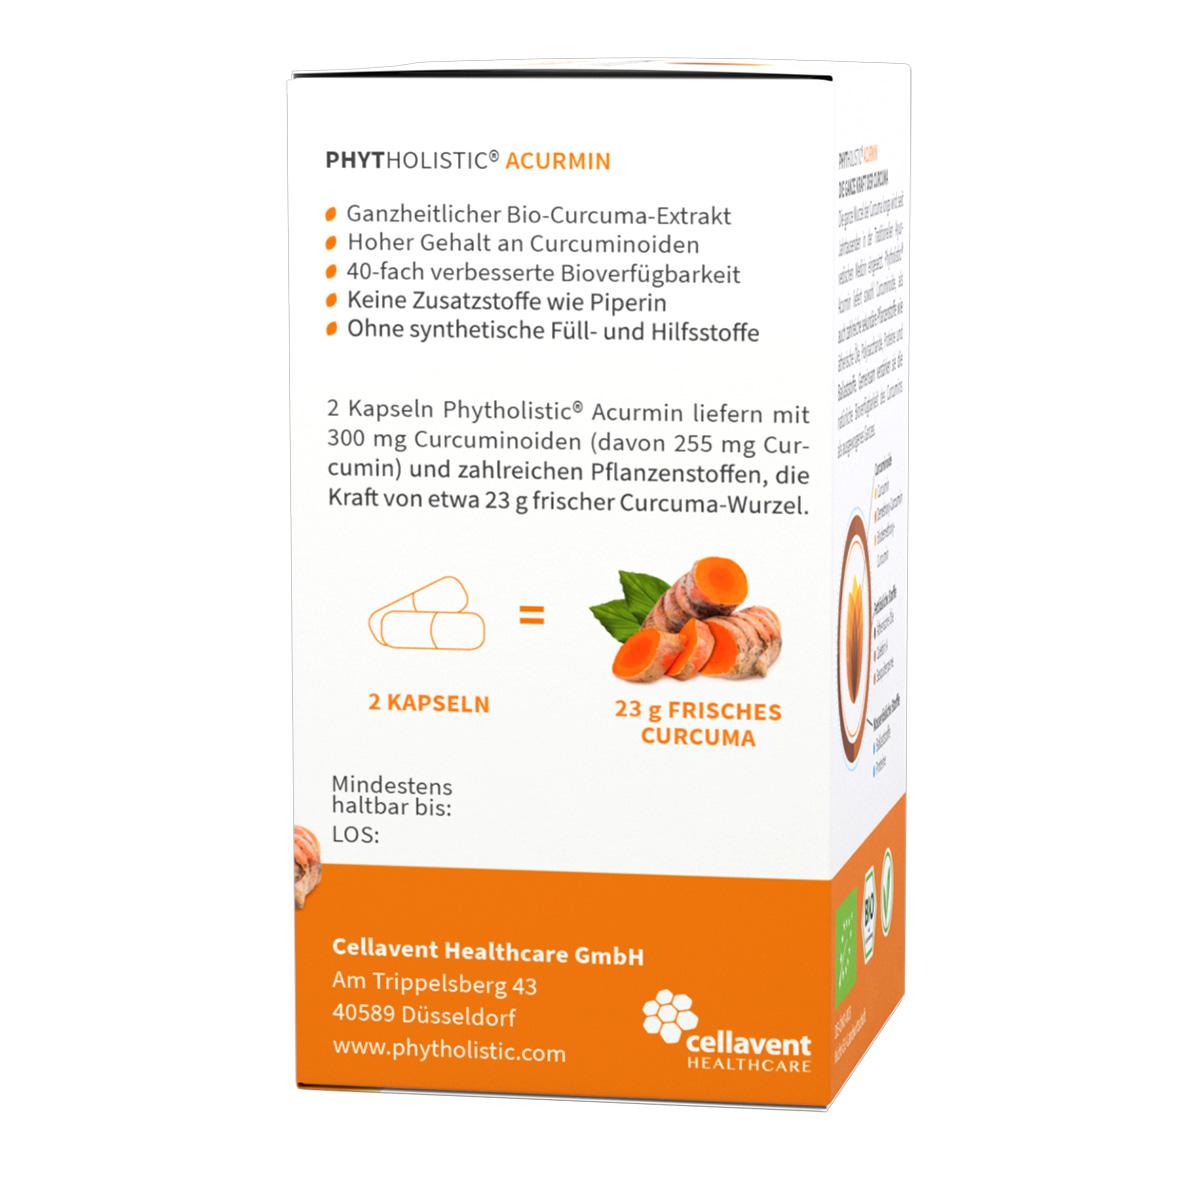 kurkuma-kapseln-bio-acurmin-phytholistic-60-stueck-verpackung-rechts-1200x1200